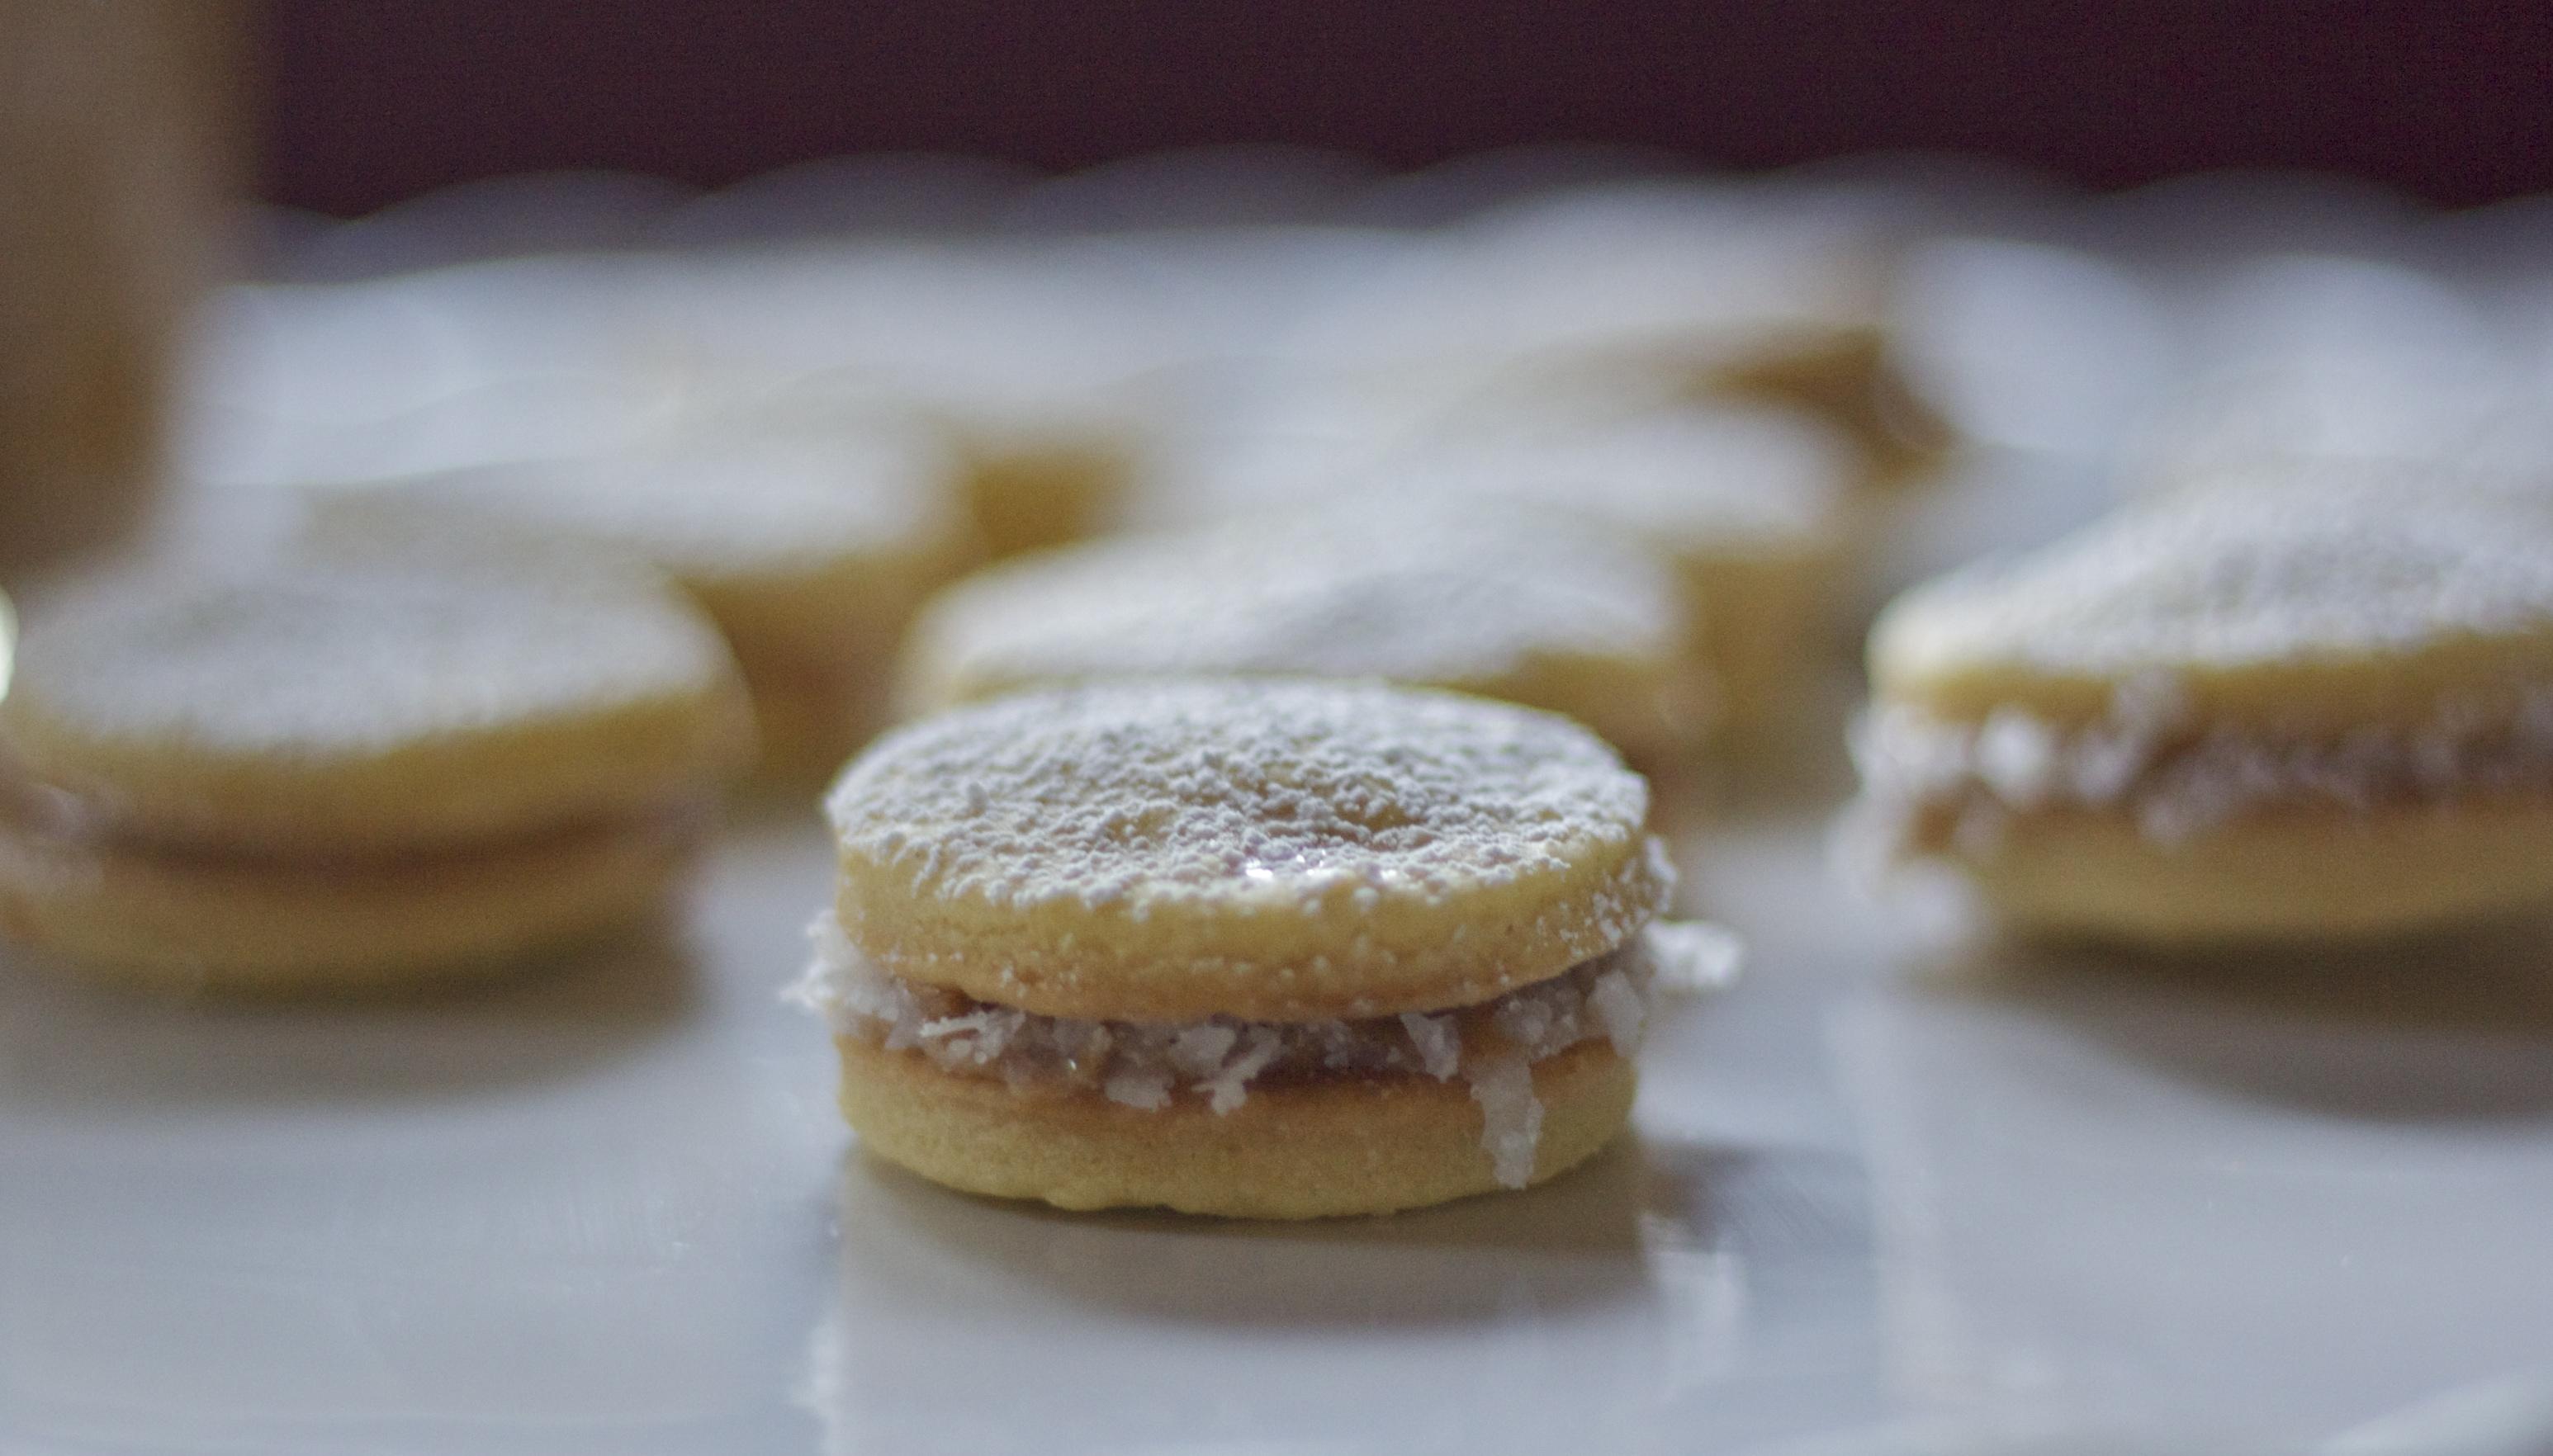 Alfajores cookies on plate.